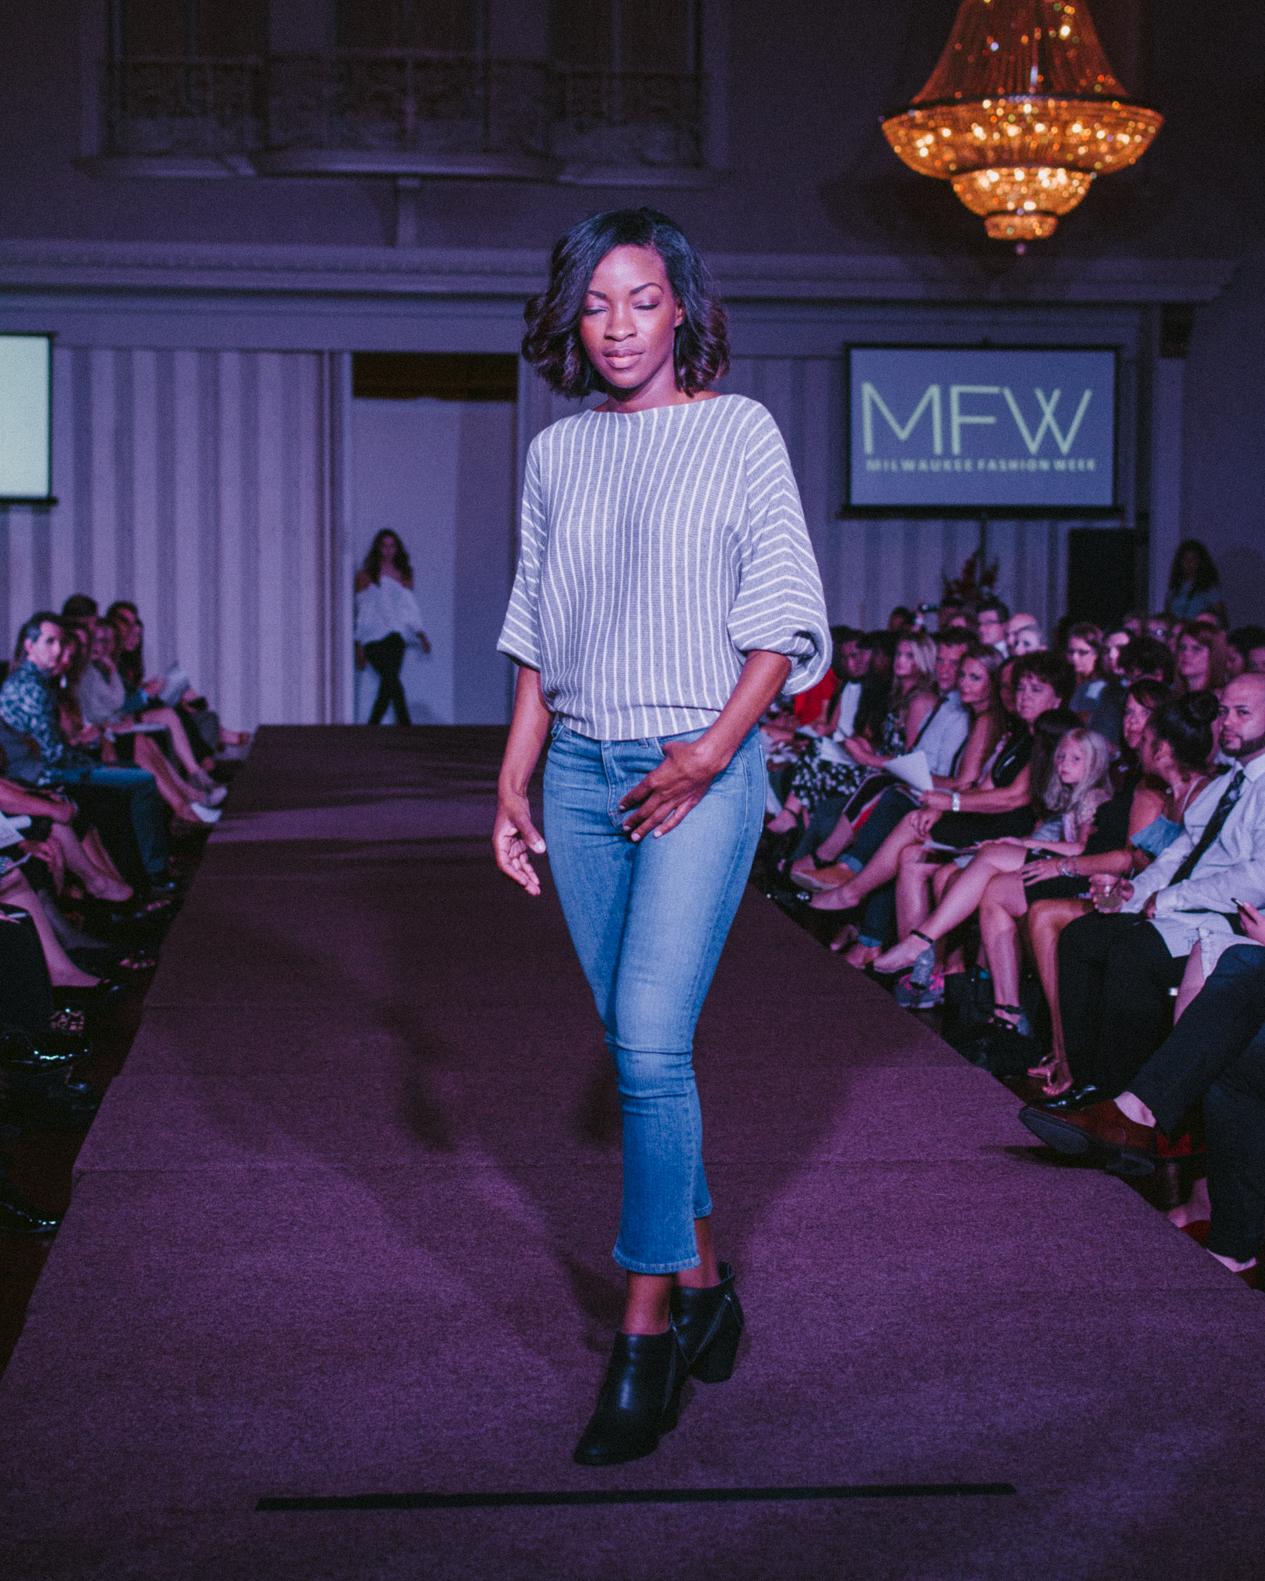 MFW_2017-09-23-2.jpg